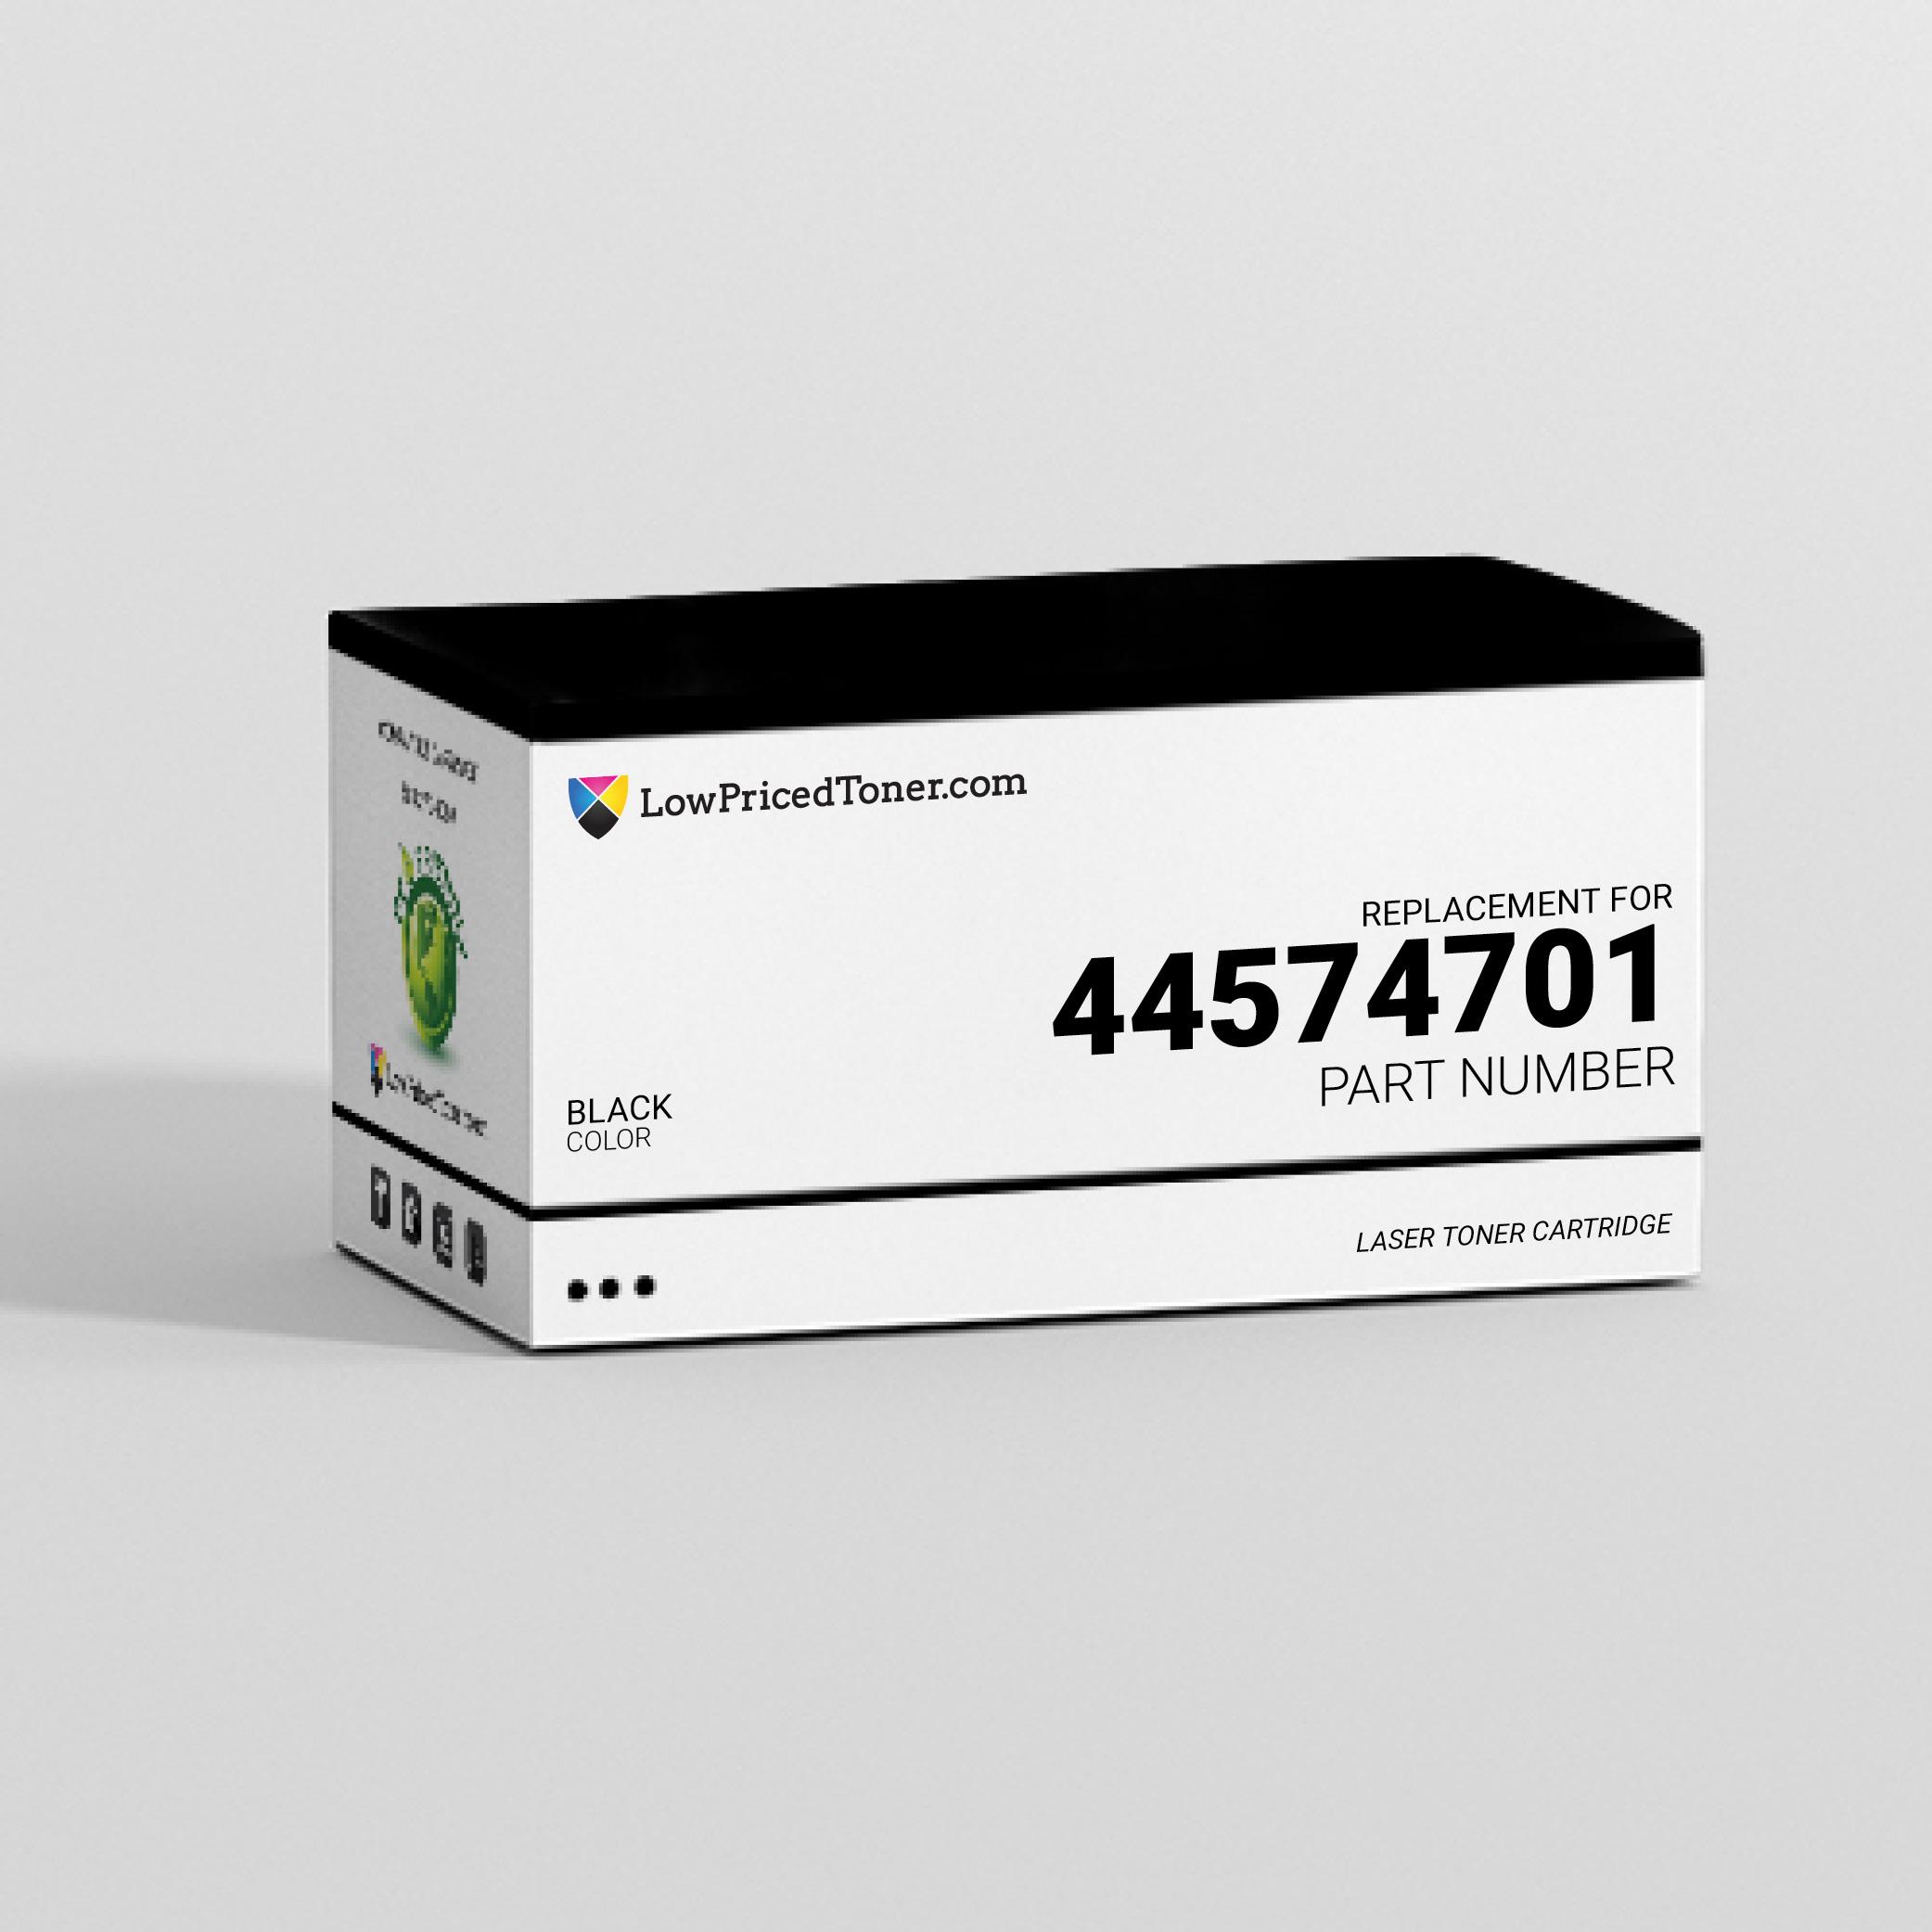 Okidata 44574701 Compatible Black Laser Toner Cartridge